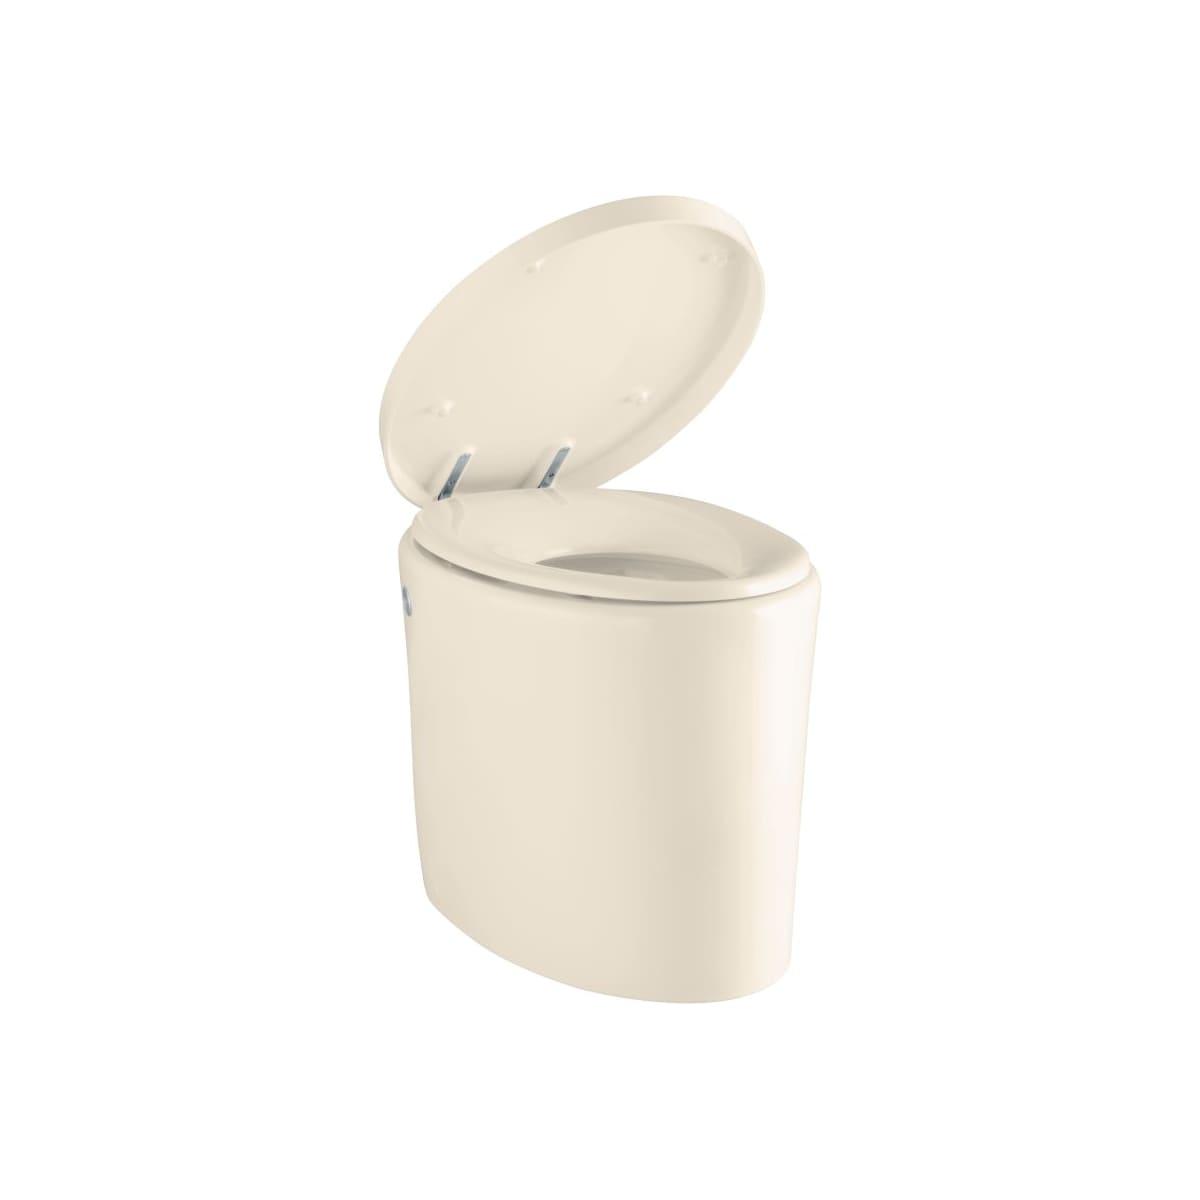 Terrific Kohler K 3492 47 Almond Purist Hatbox Toilet With Quiet Inzonedesignstudio Interior Chair Design Inzonedesignstudiocom